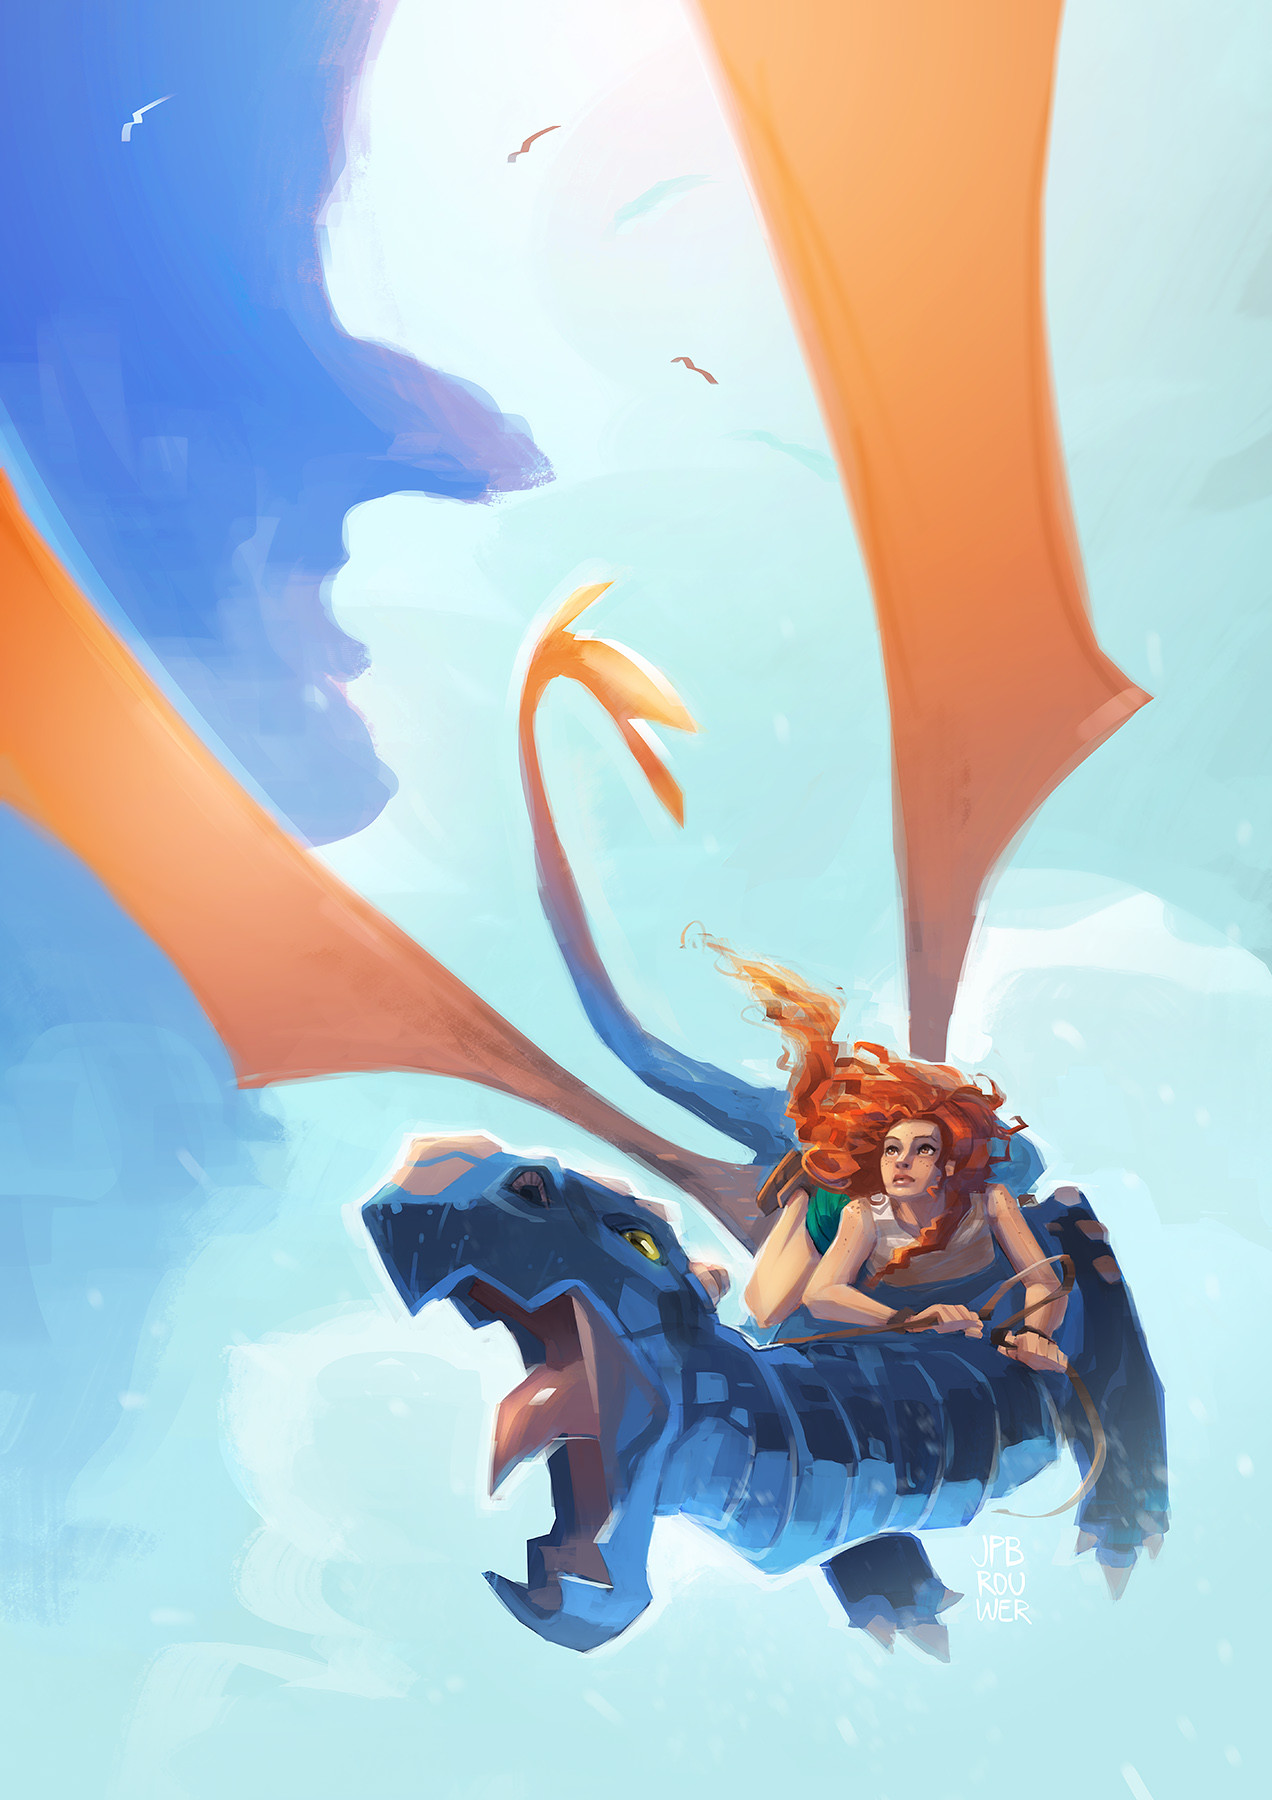 James brouwer dragoon